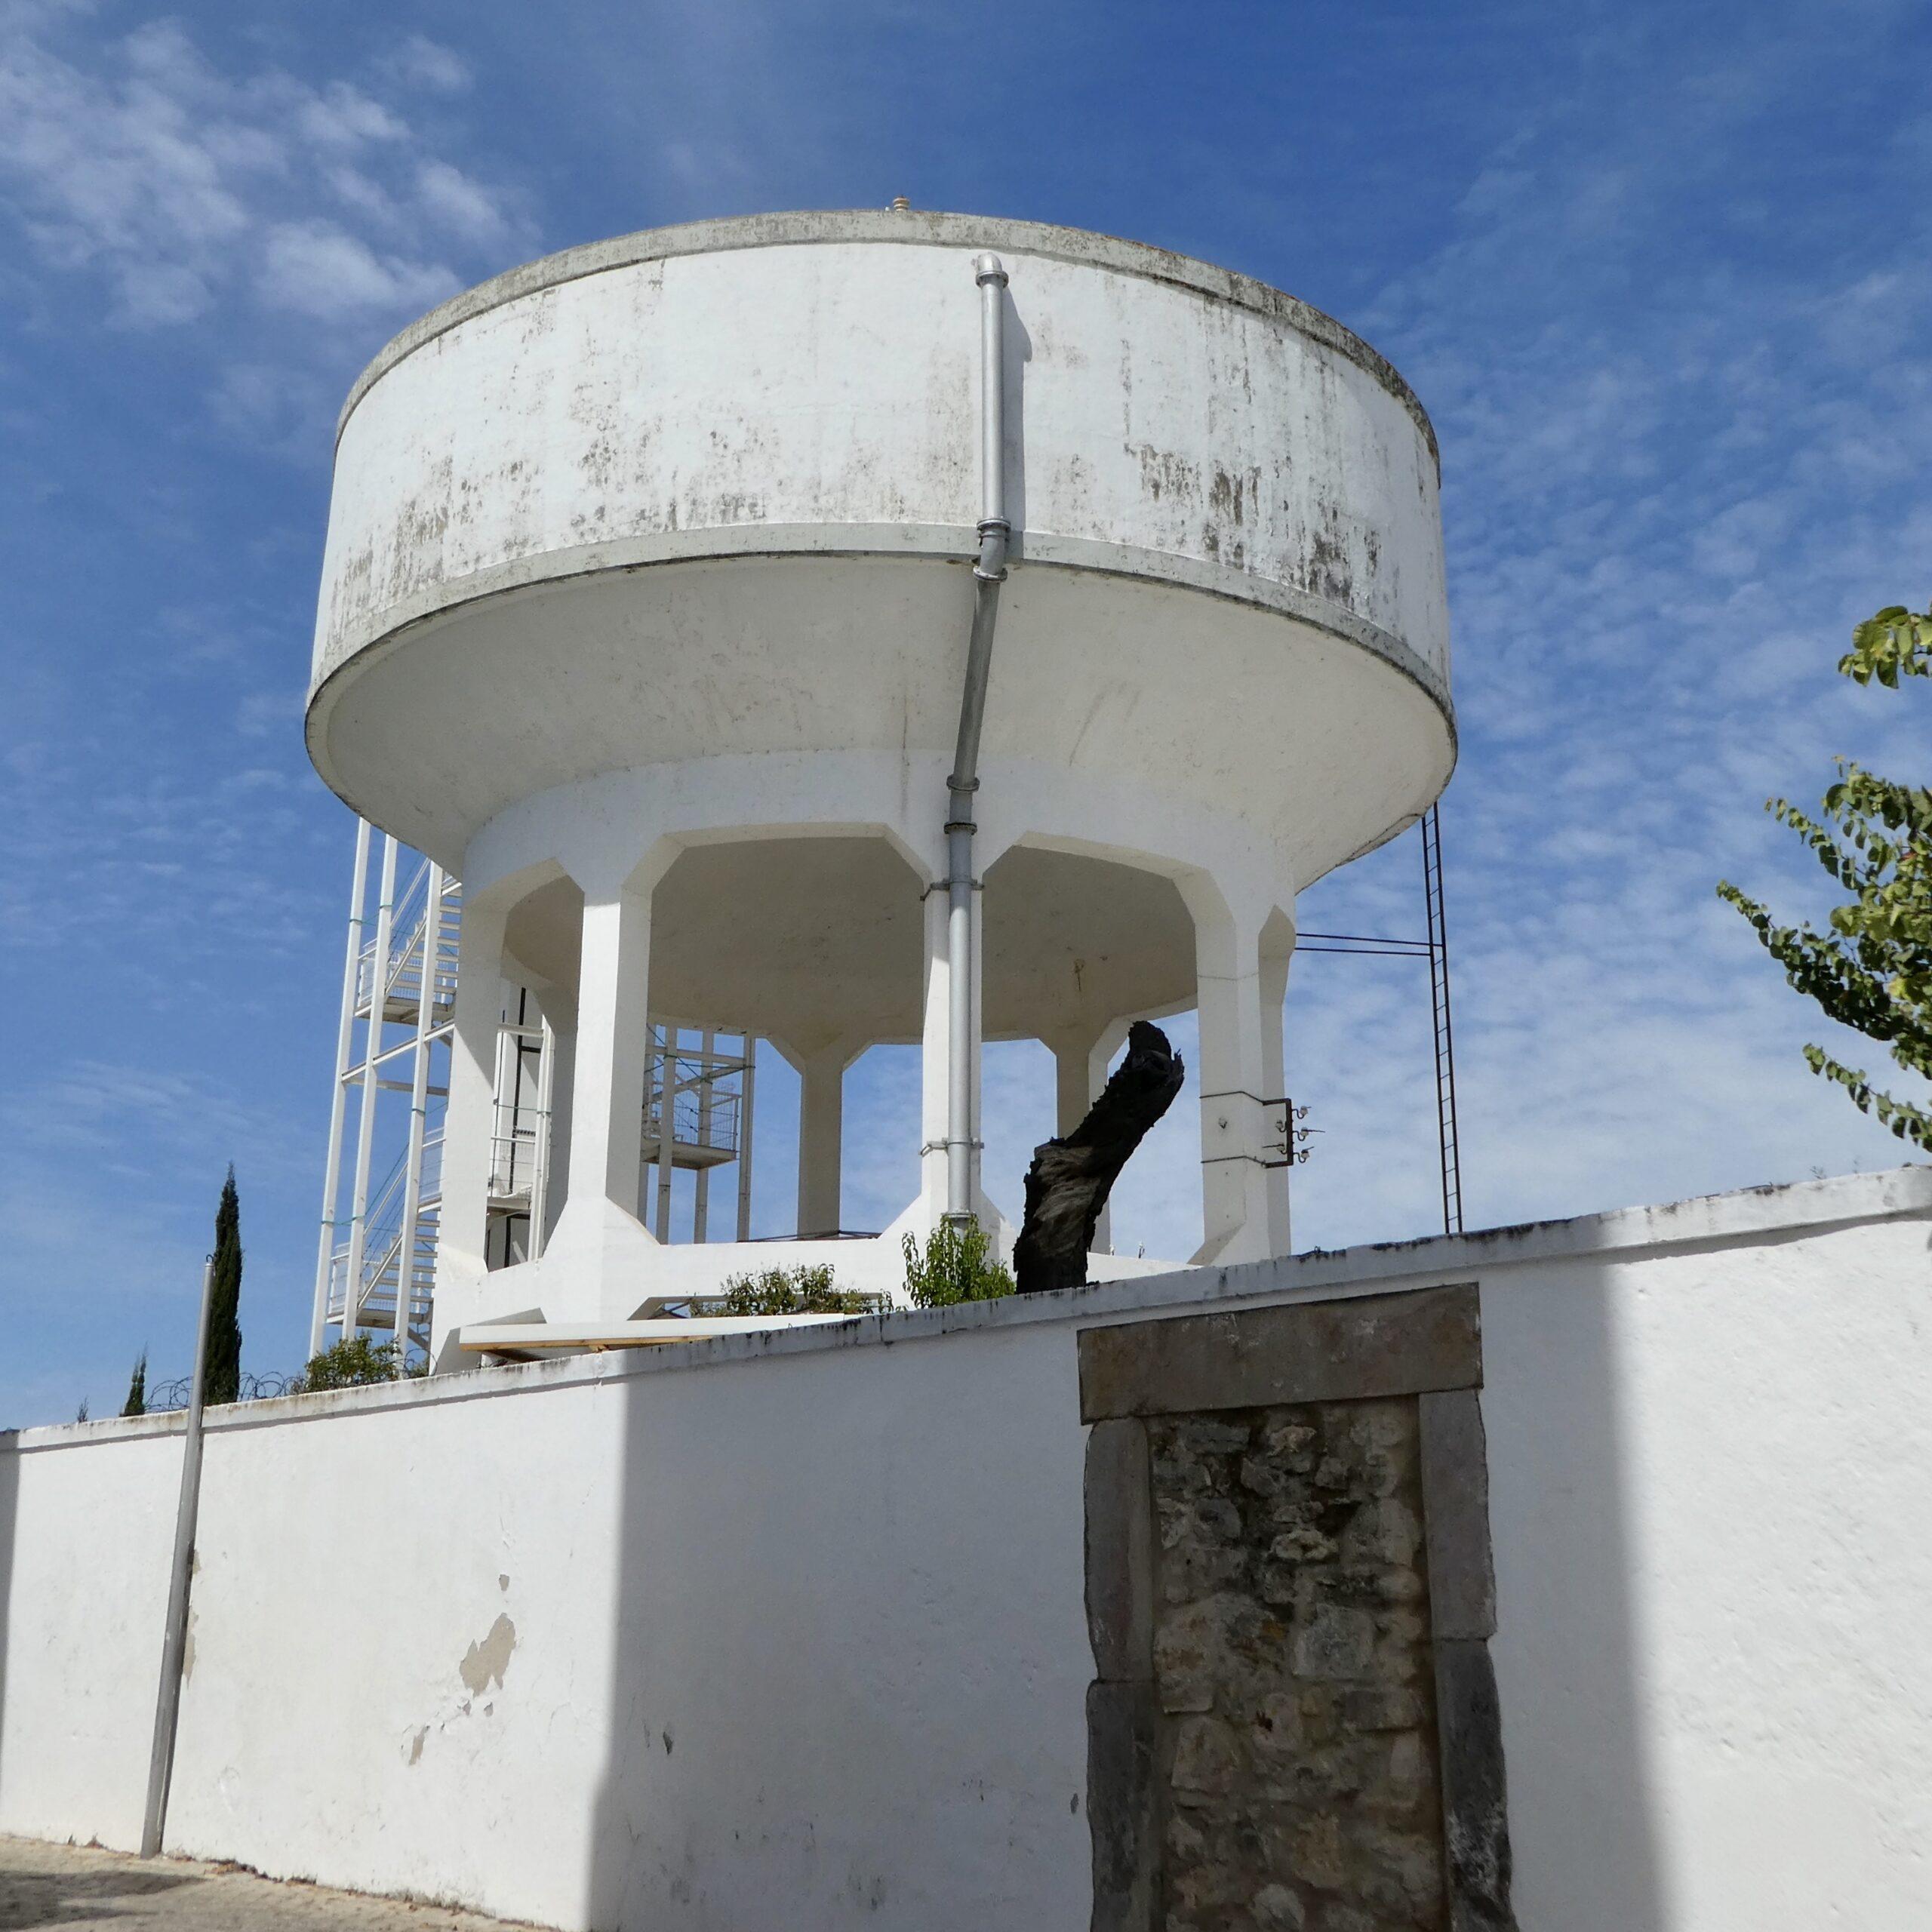 Camera Obscura in Tavira